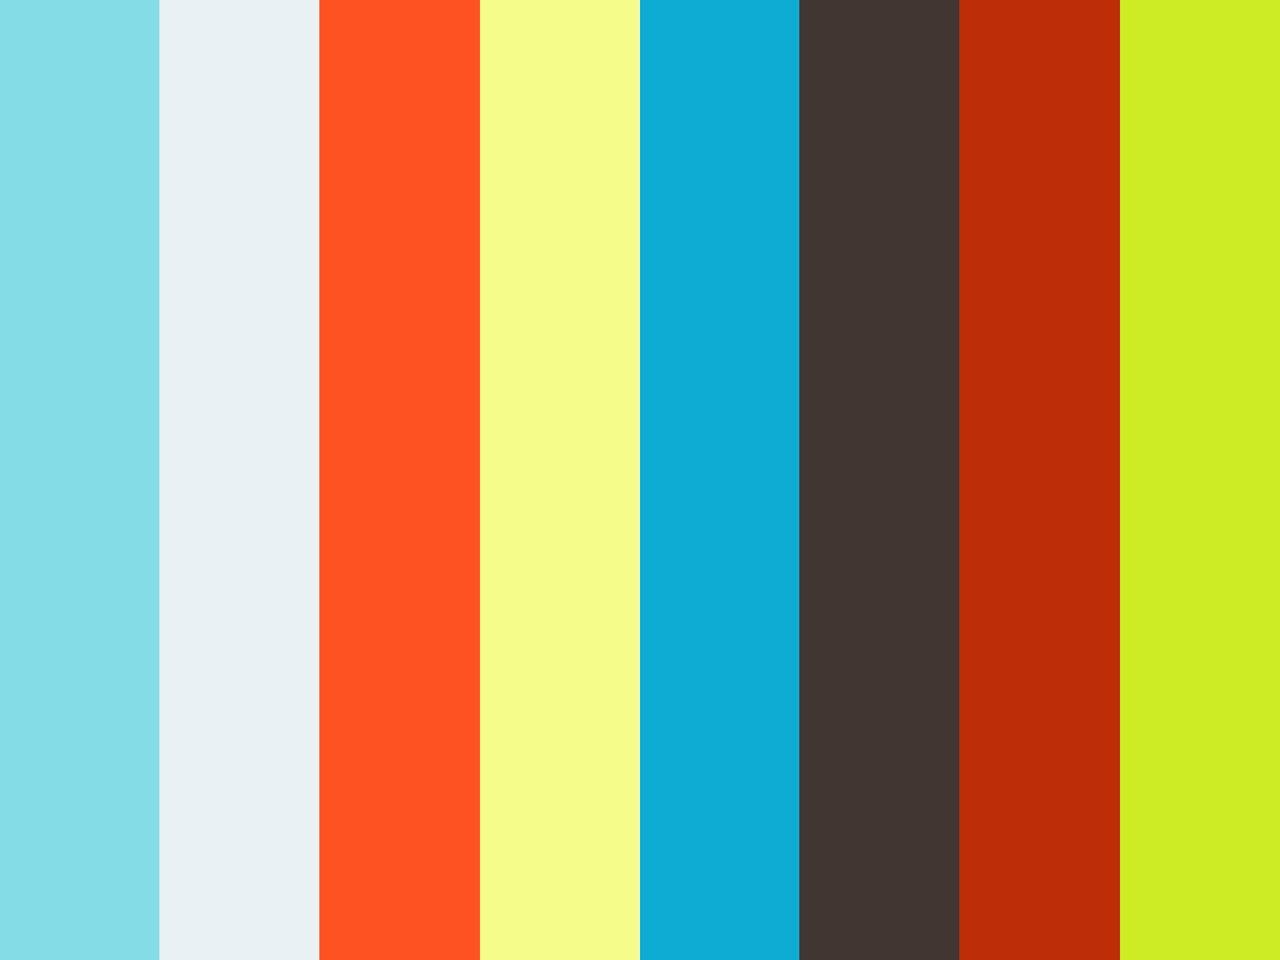 002735 - CORP - Ohlala BehaKlas - Tip 02 - Voldoende keuze